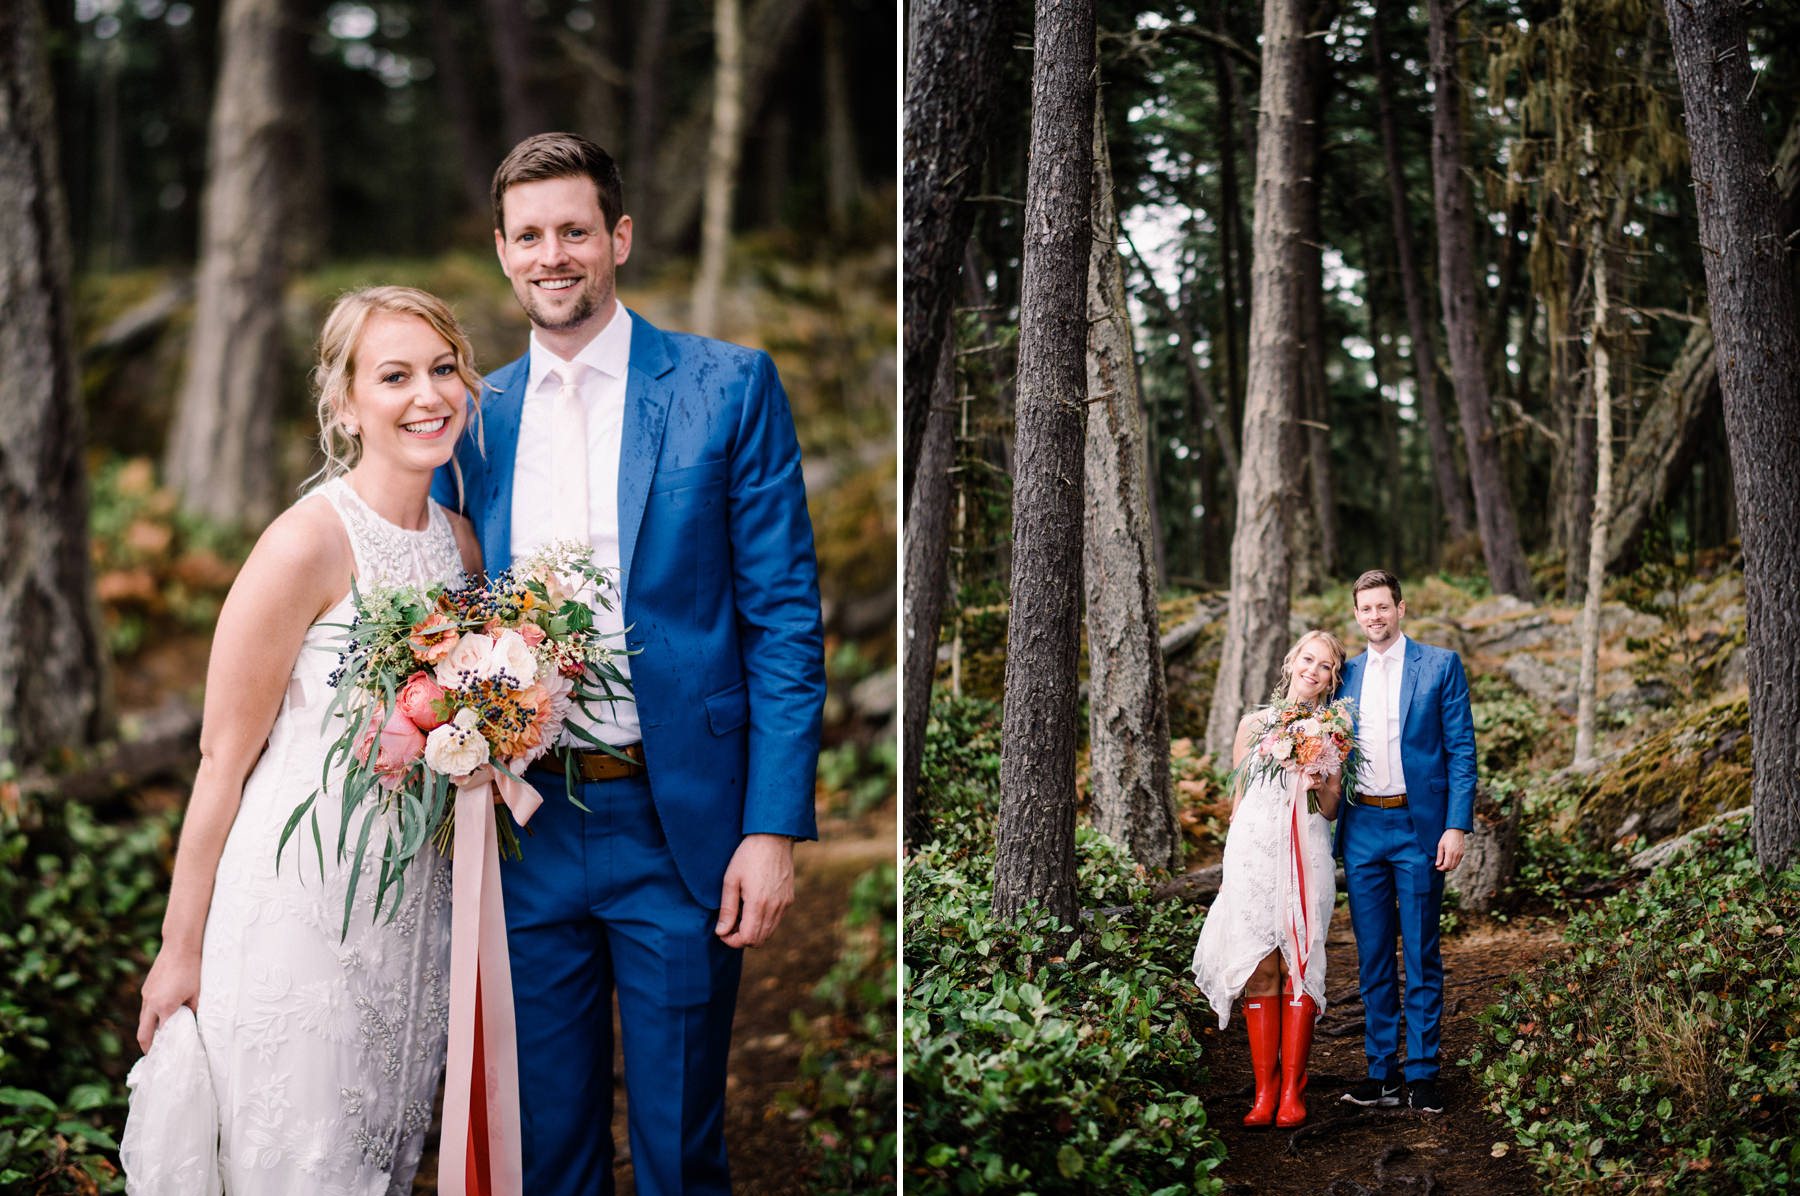 283-colorful-outdoor-lopez-island-wedding.jpg